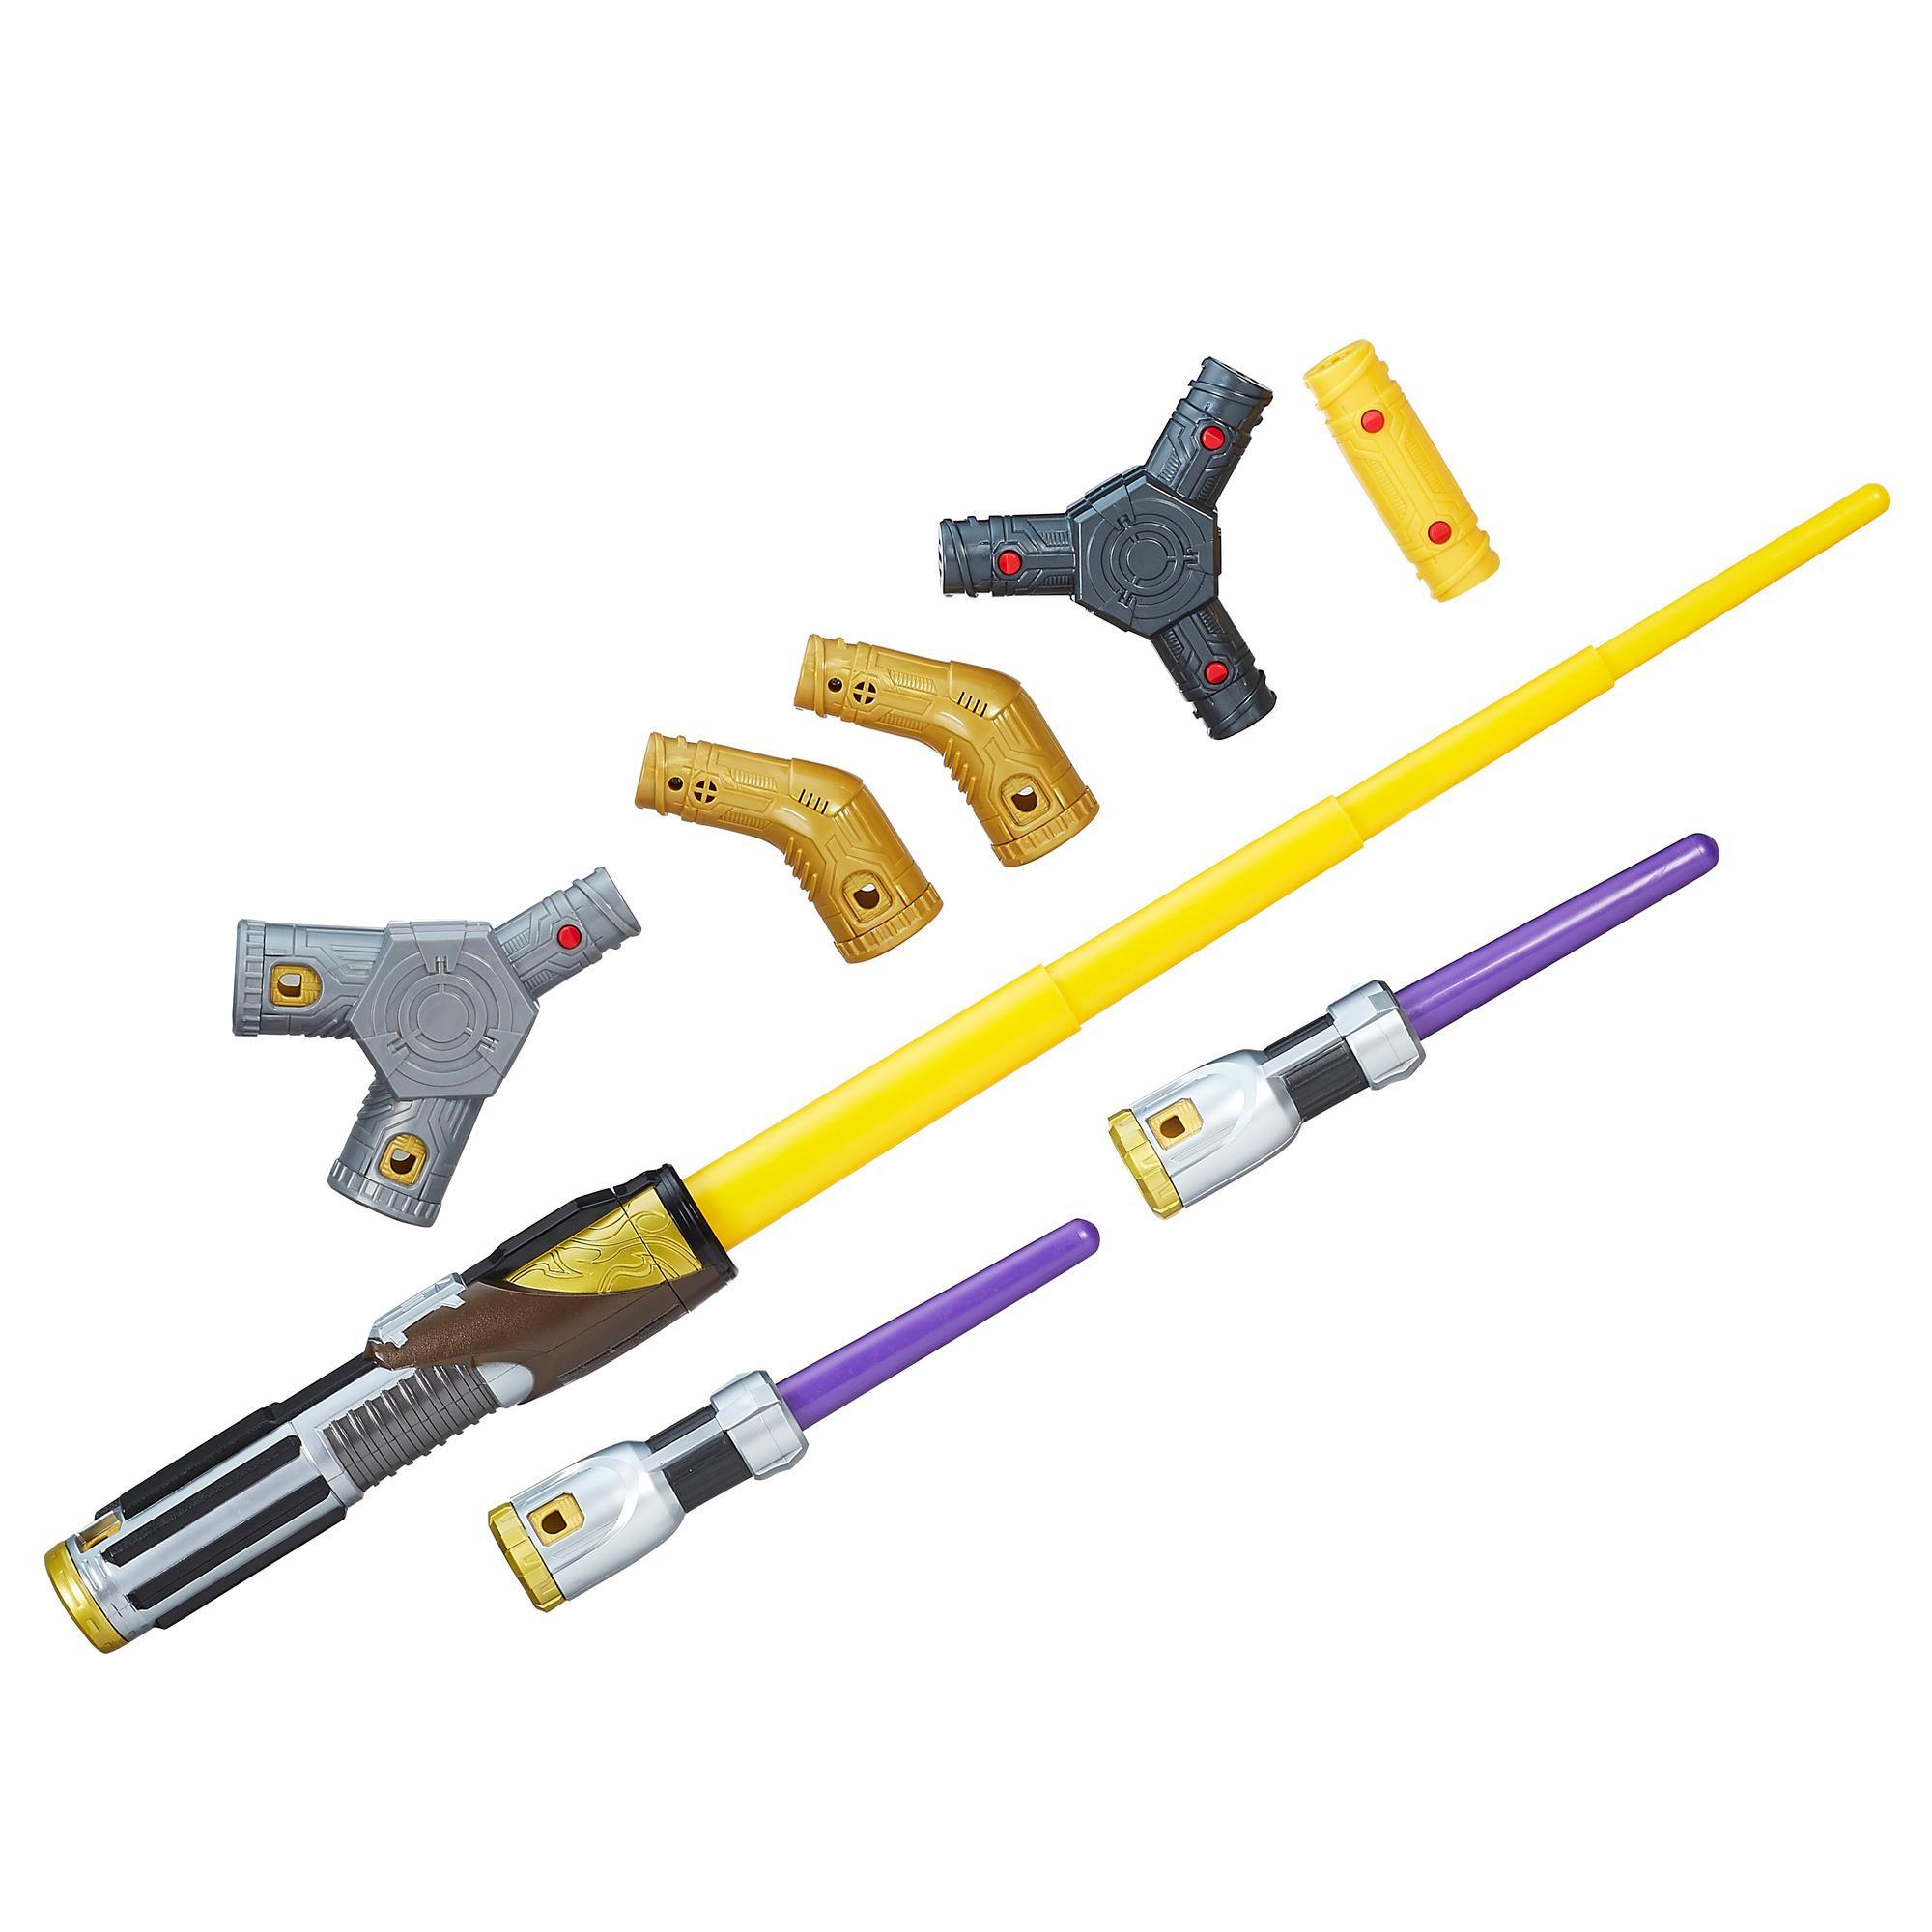 Star Wars: The Last Jedi Bladebuilders Jedi Knight Lightsaber